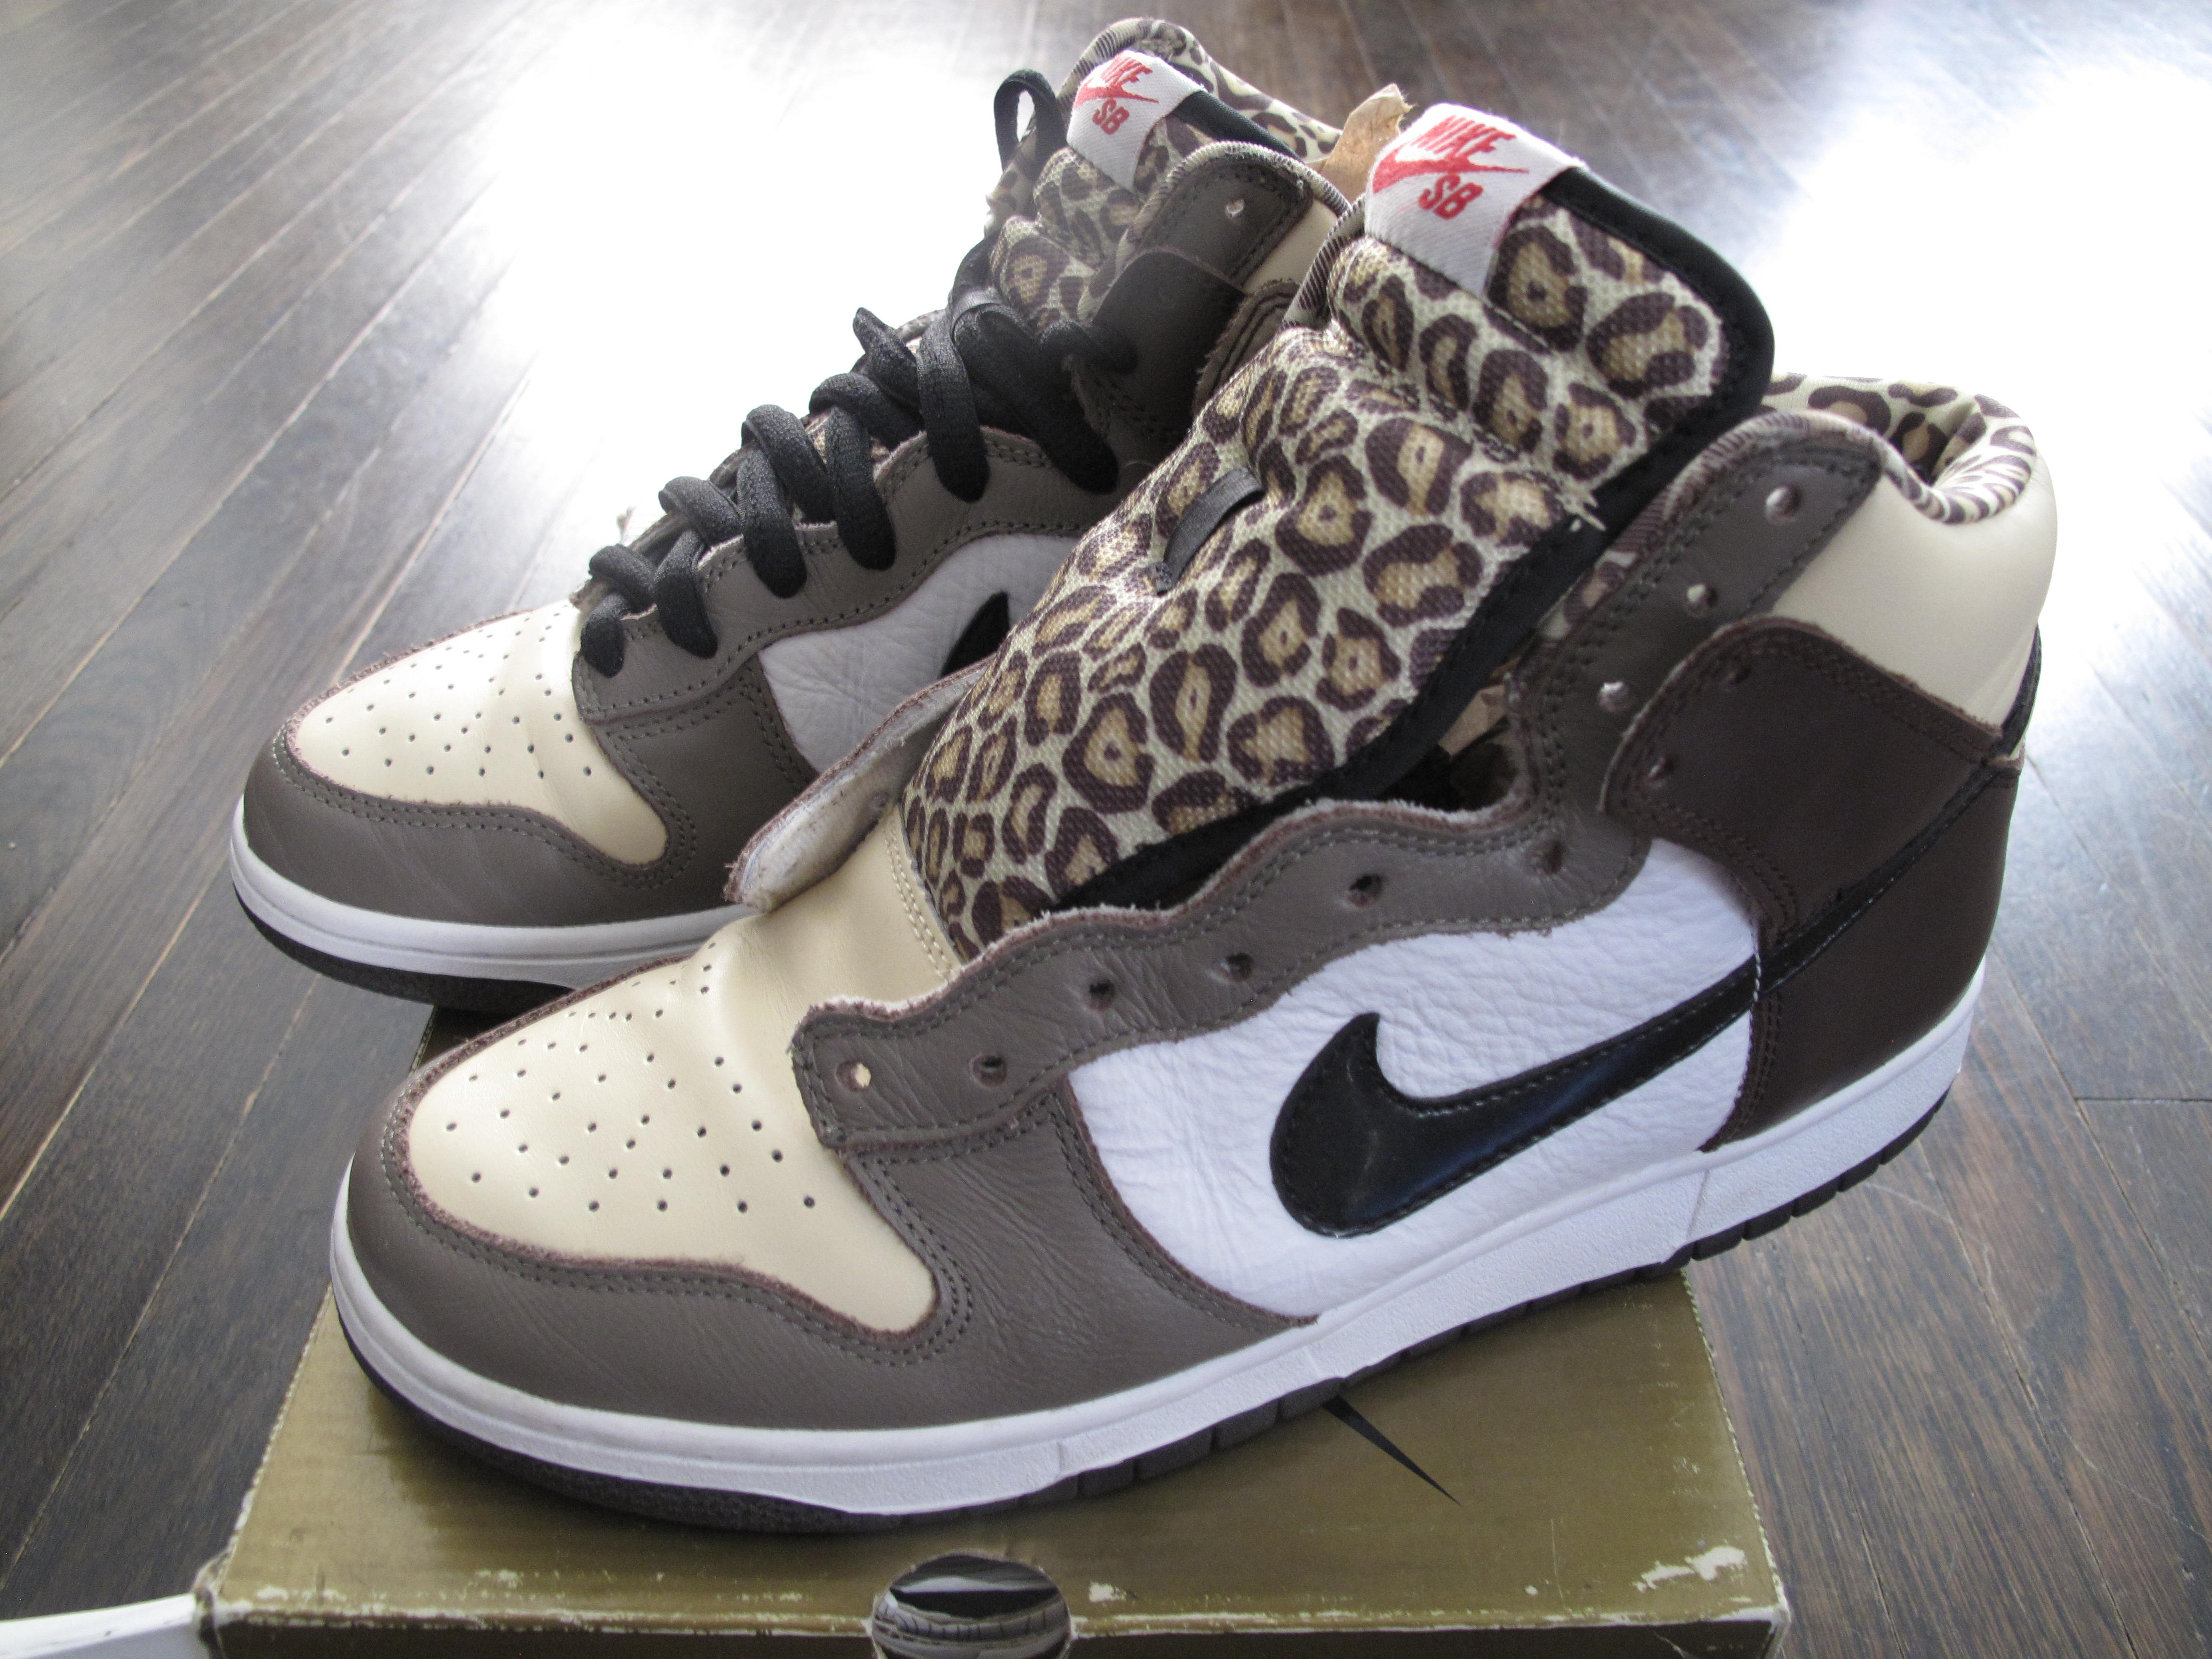 quality design c34a4 49a1d Nike SB Dunk High Ferris Bueller